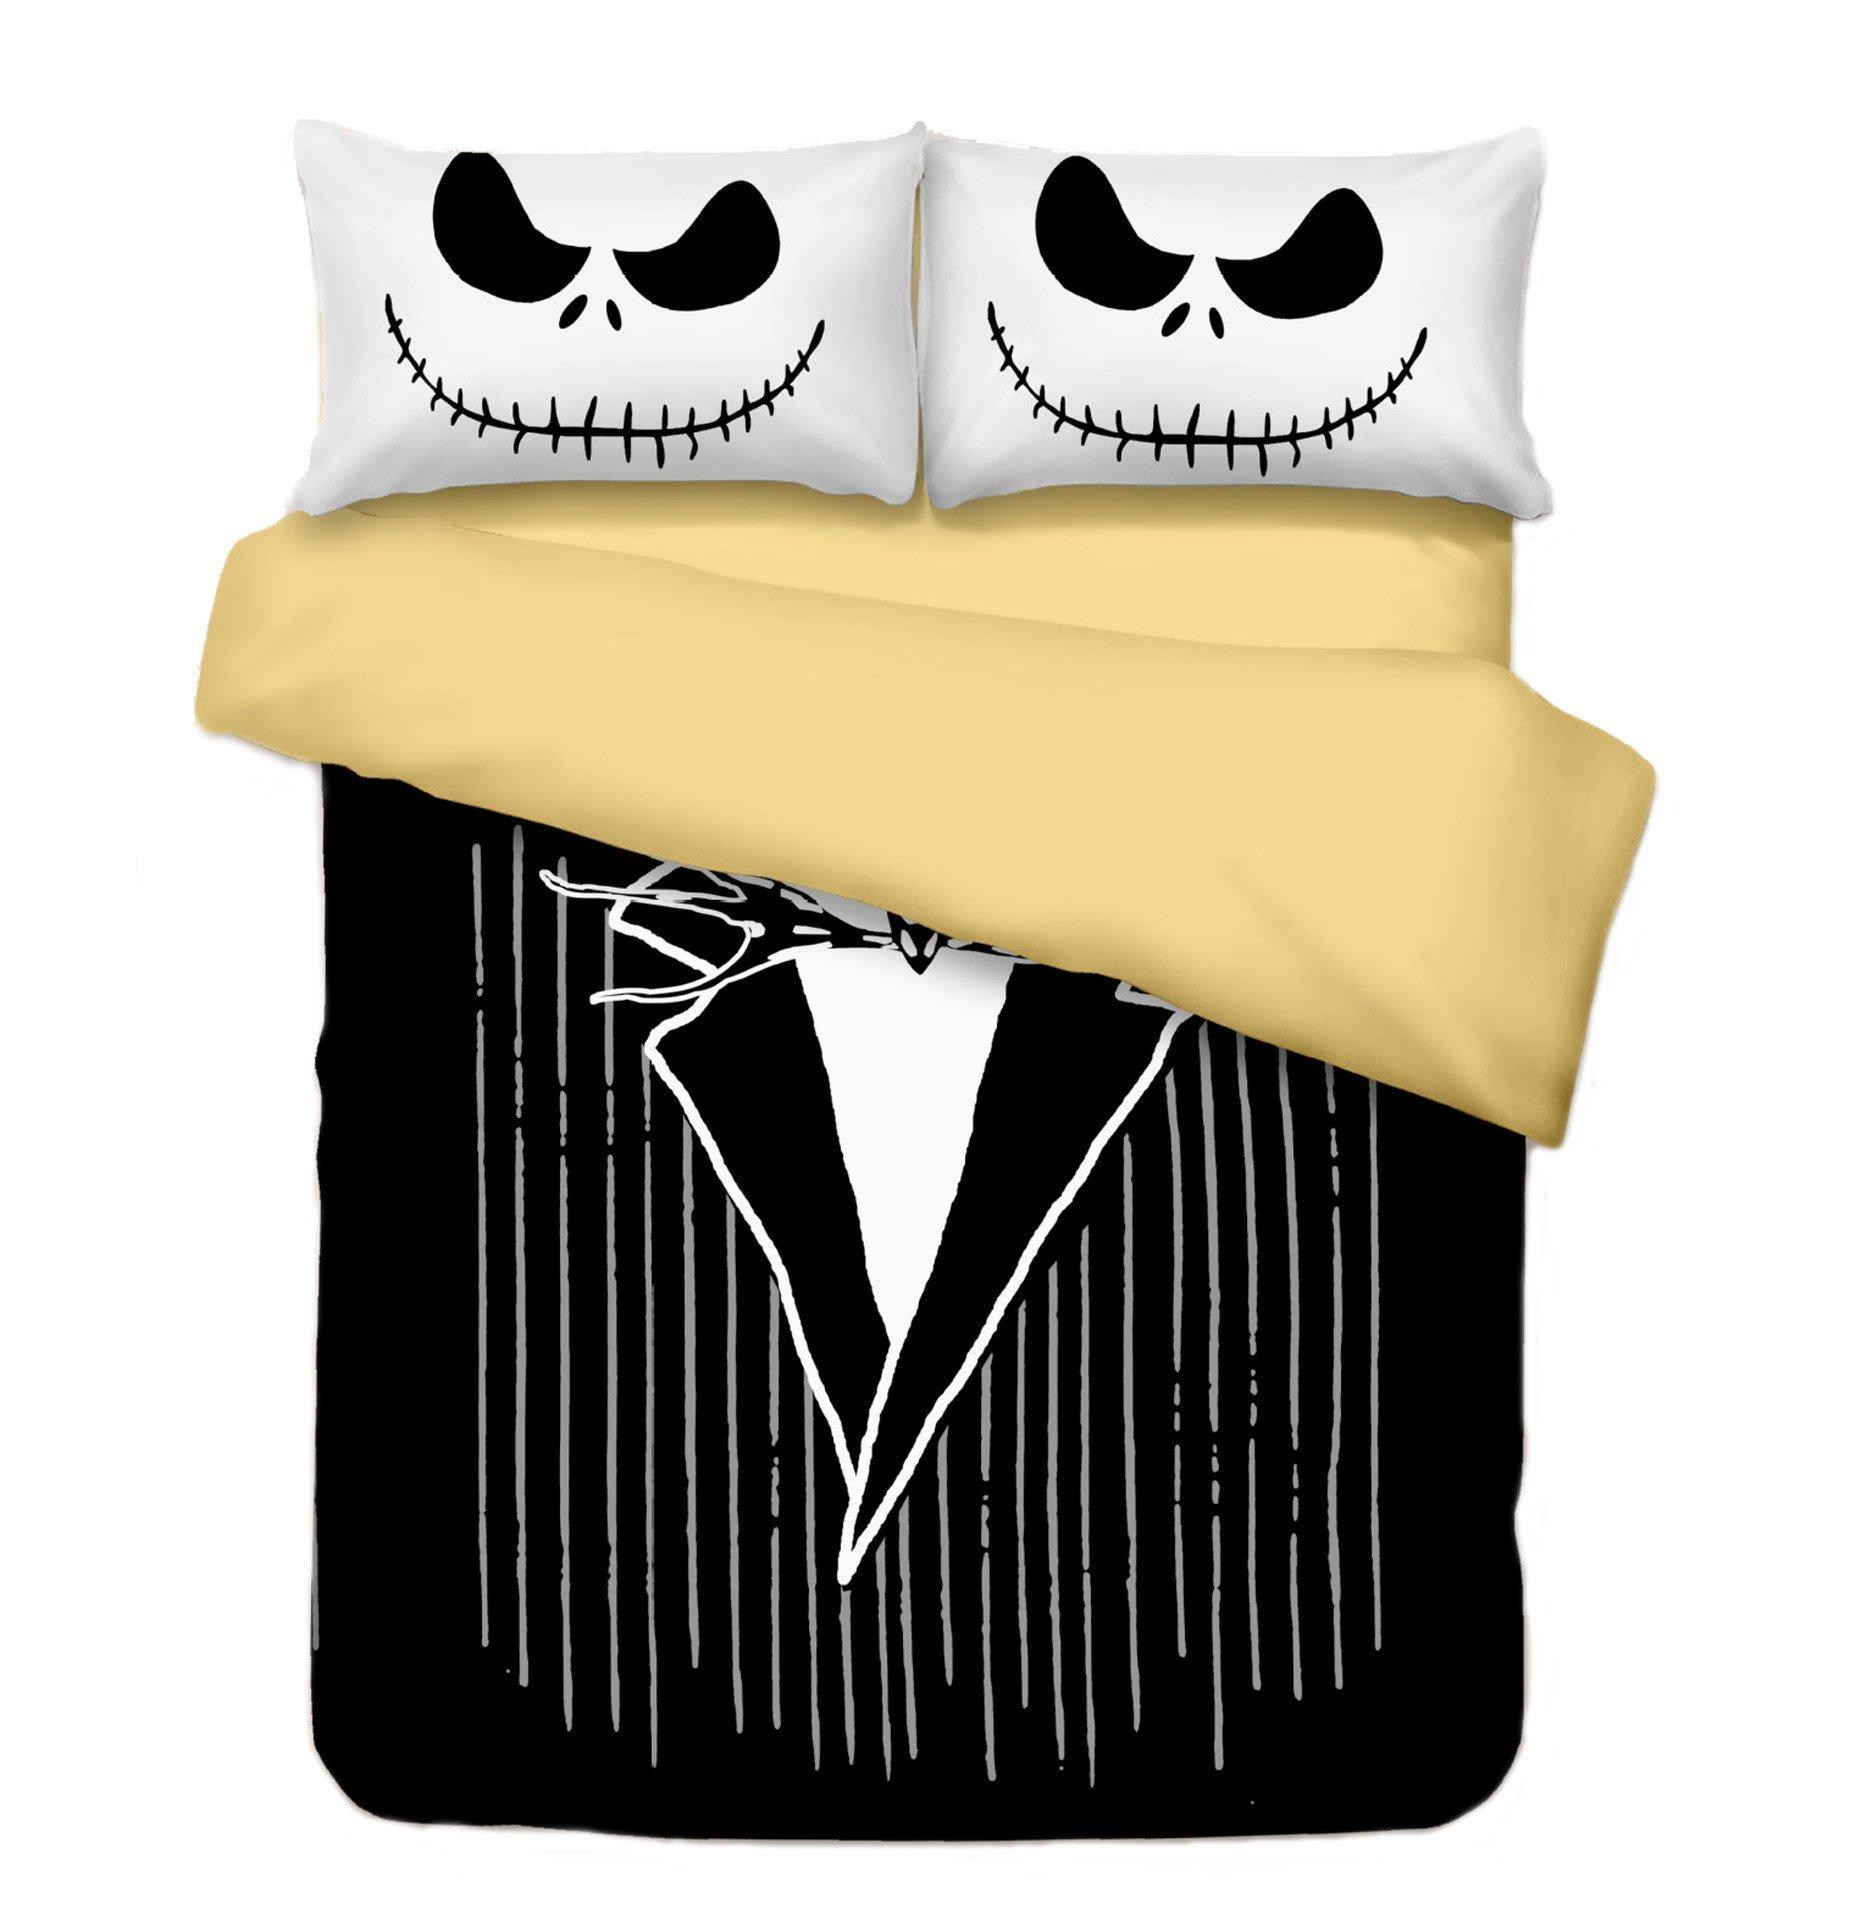 KTKRR Christmas Duvet Cover Set (no comforter),Scarecrow Style Nightmare Before Christmas 3pc Bedding Set, Duvet Cover with Pillowcase Gift 3D Terrorist Design (CAL KING, Jack clothing)